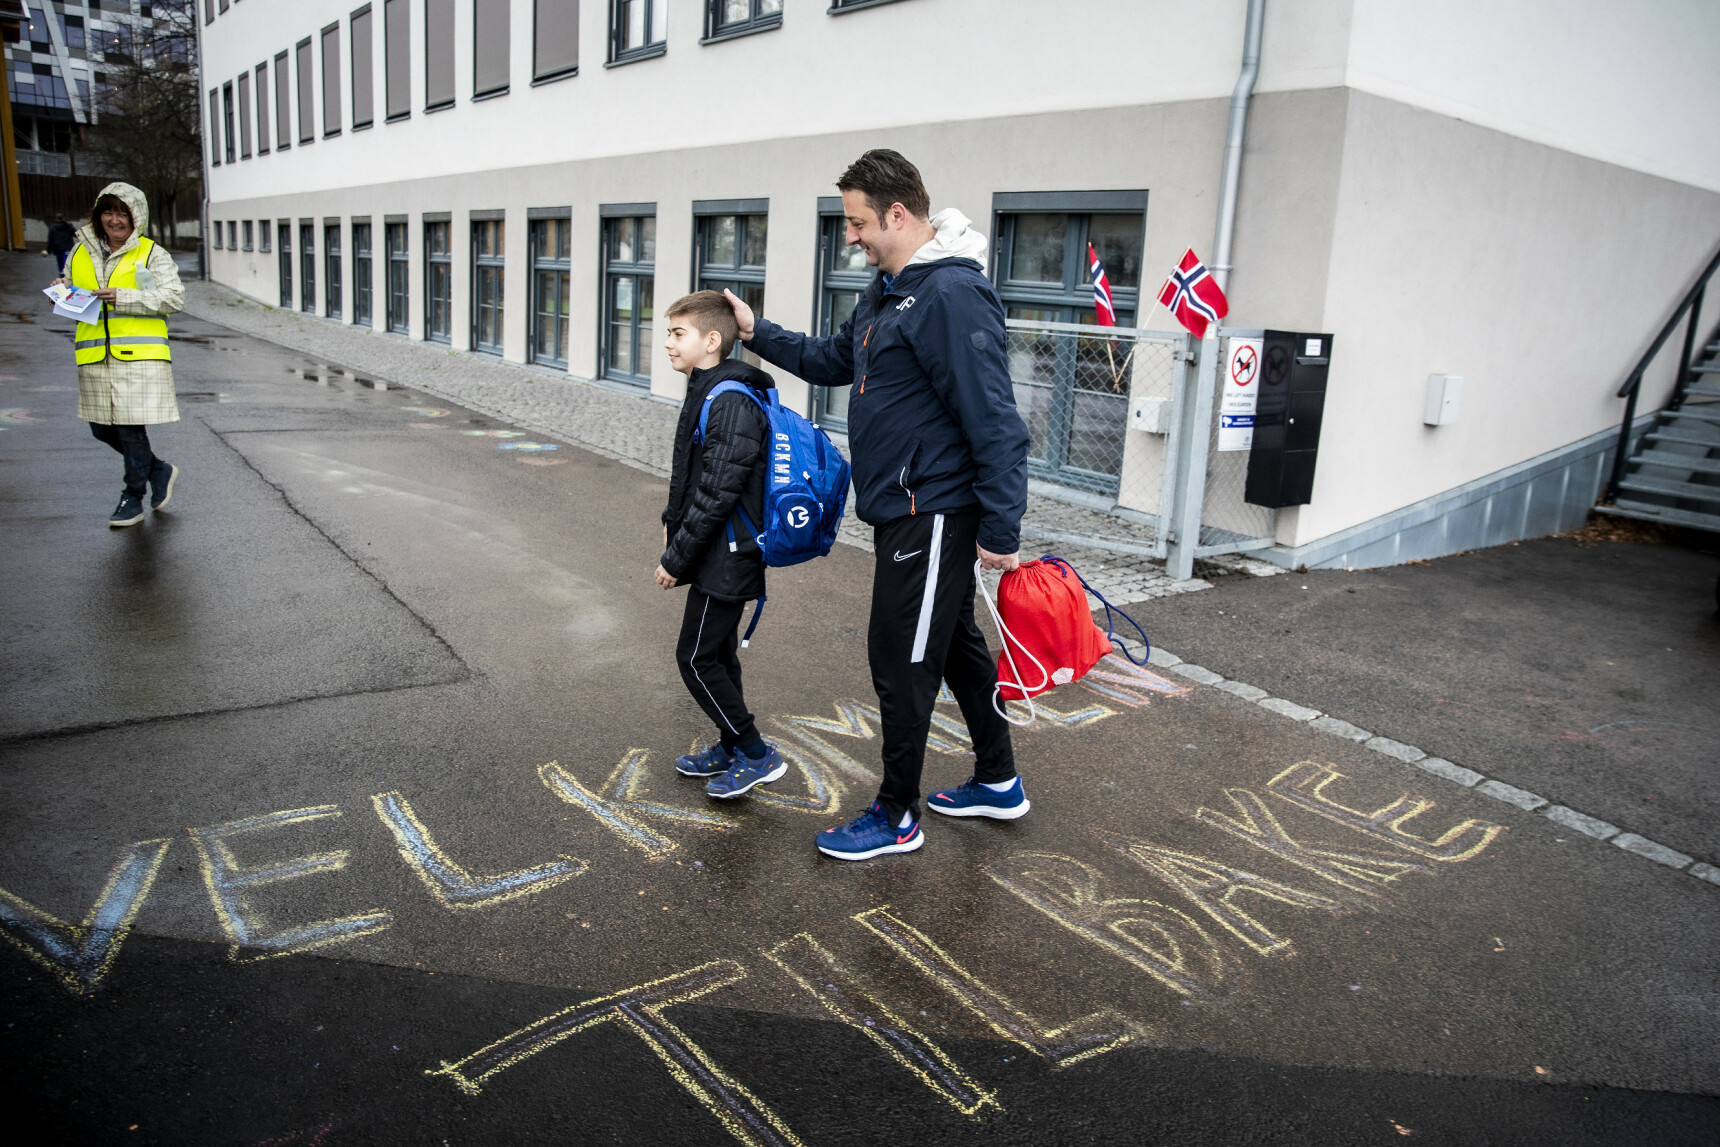 SKOLER ÅPNES: Drazern Bajcetic fulgte sønnen Lav Bejcetic til skoleporten ved Løren skole. Foto: Bjørn Langsem/Dagbladet.